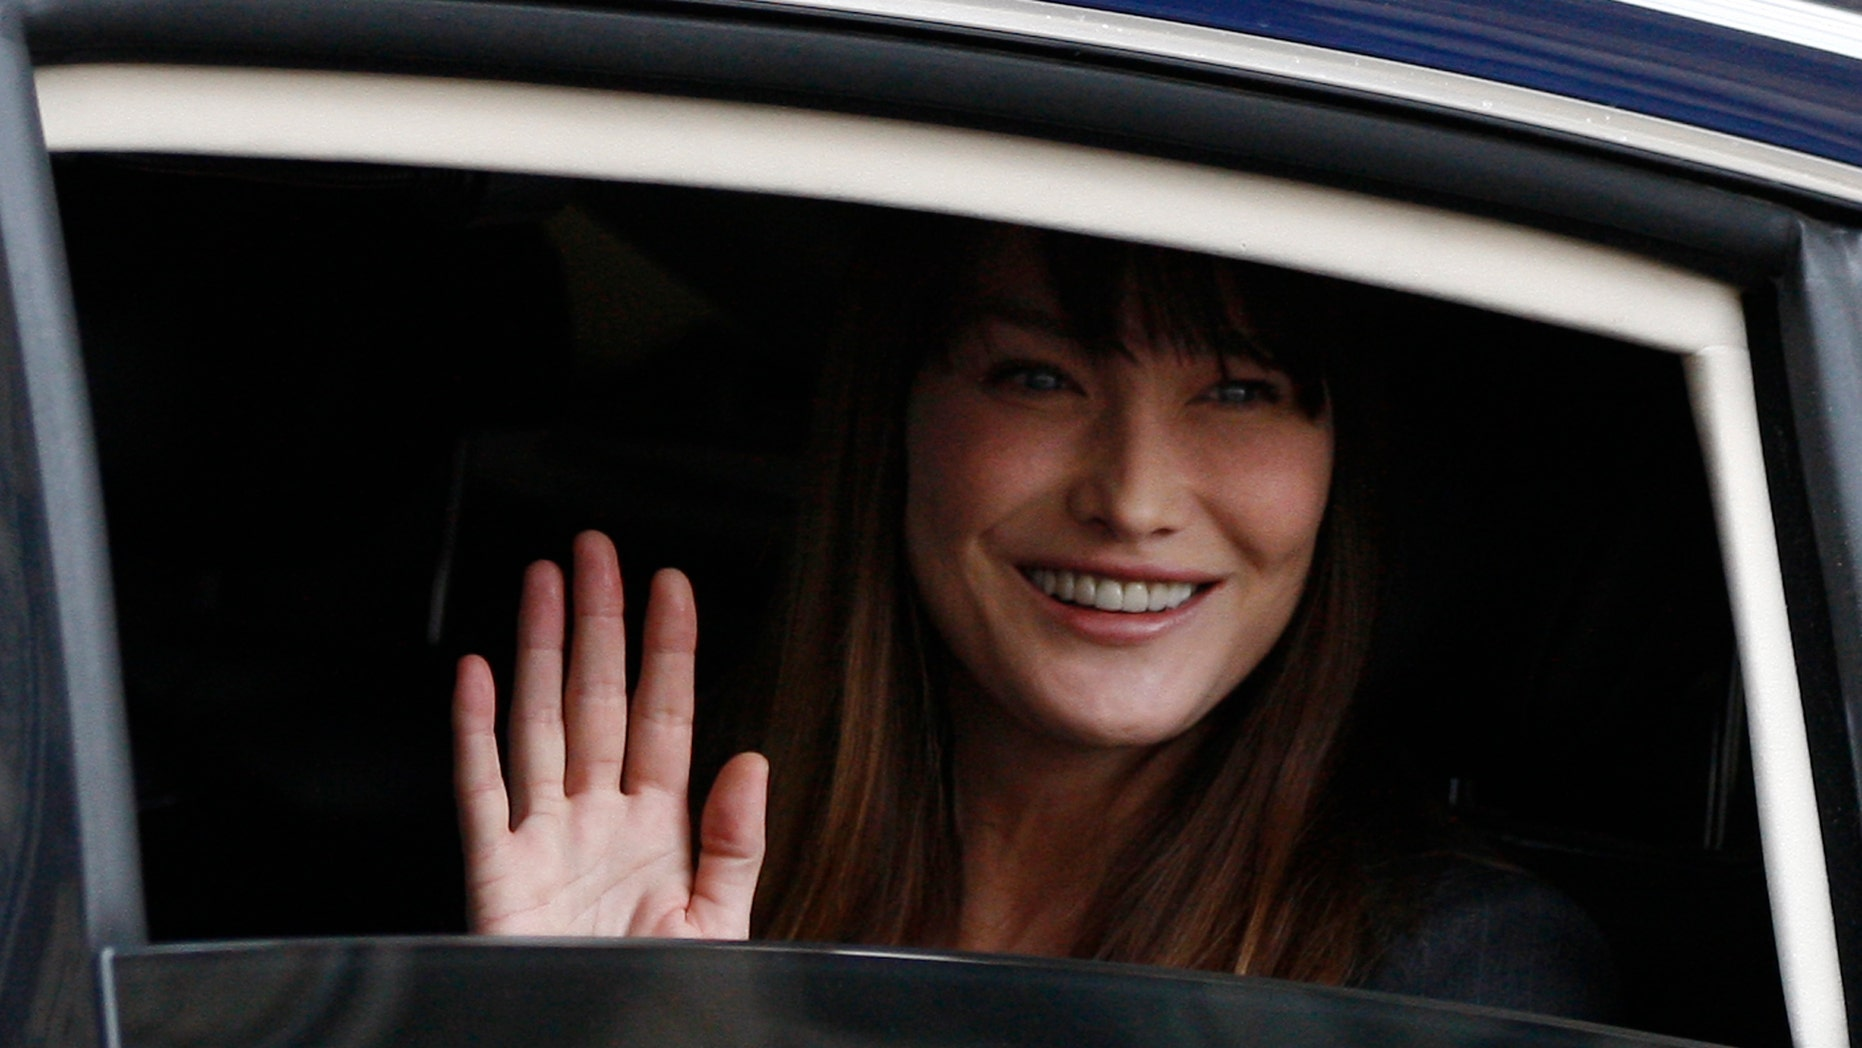 May 15, 2012 FILE photo of Carla Bruni-Sarkozy, wife of outgoing President Nicolas Sarkozy.